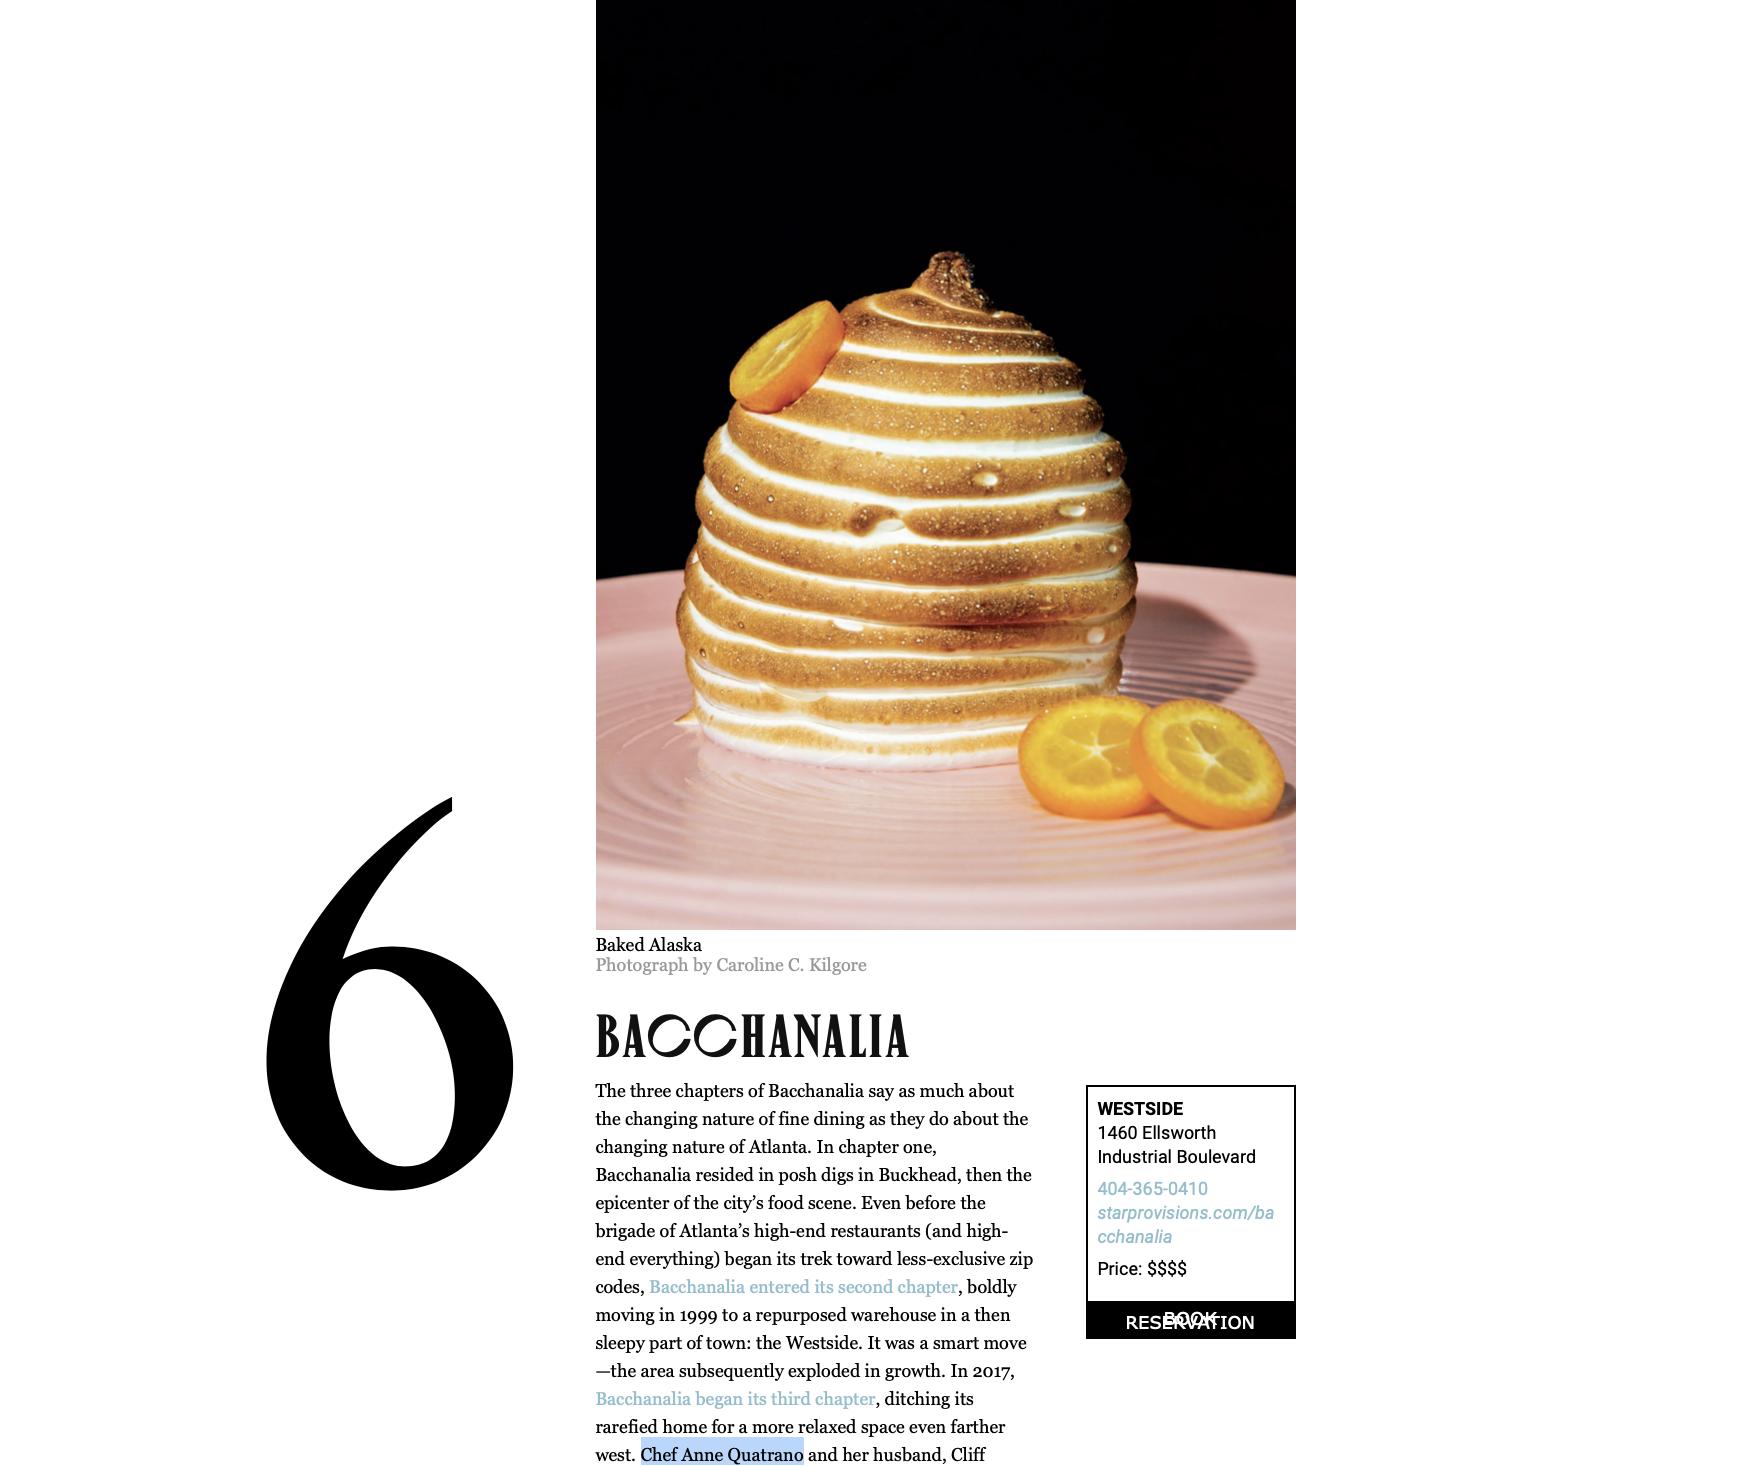 Atlanta Best Restaurants 2019 Chef Anne Quatrano Lands Two of Atlanta Magazine's 75 Best